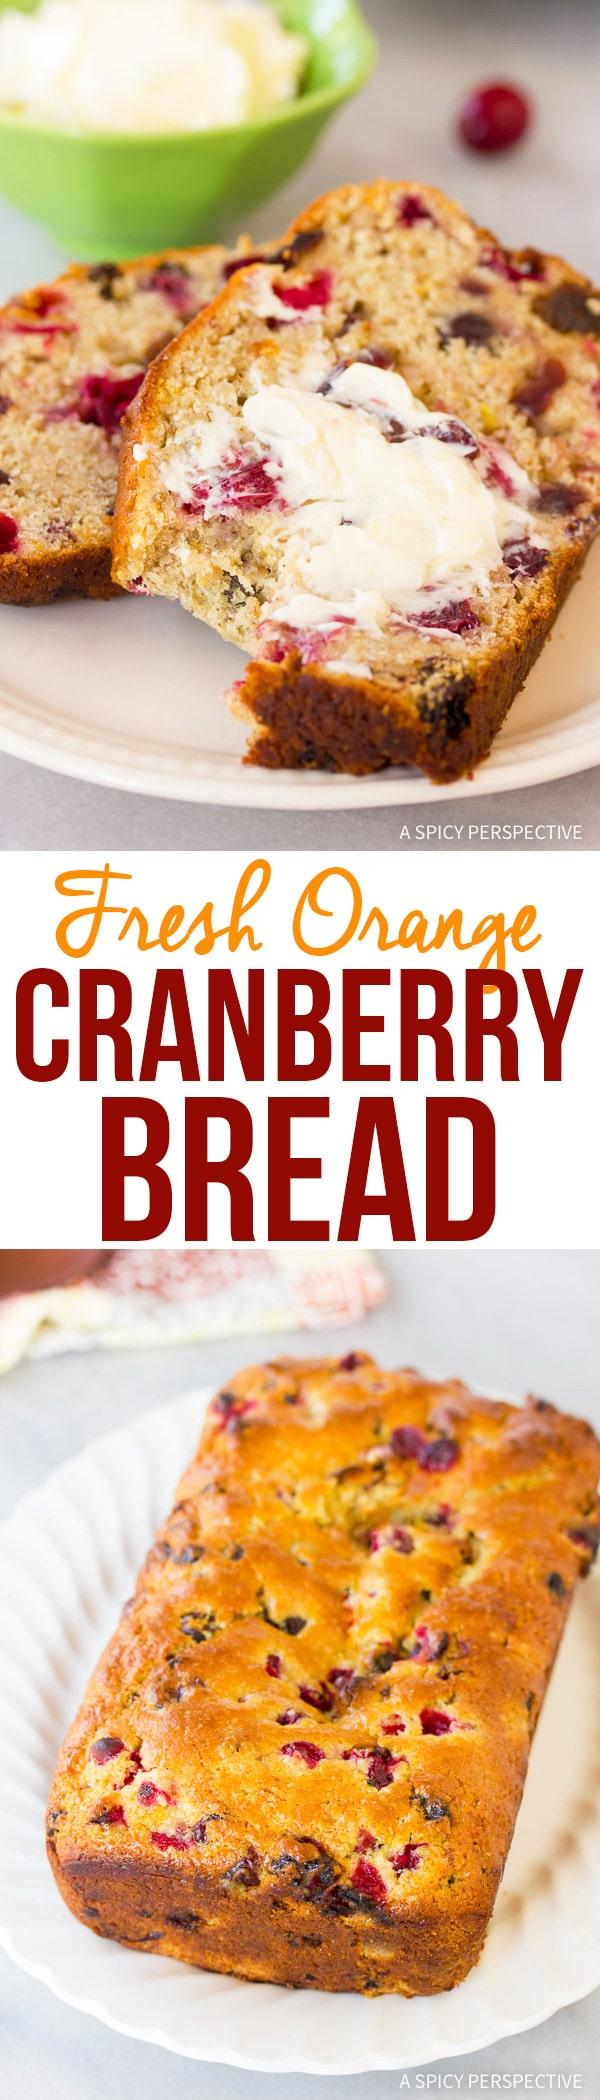 Warm Fresh Orange Cranberry Bread Recipe